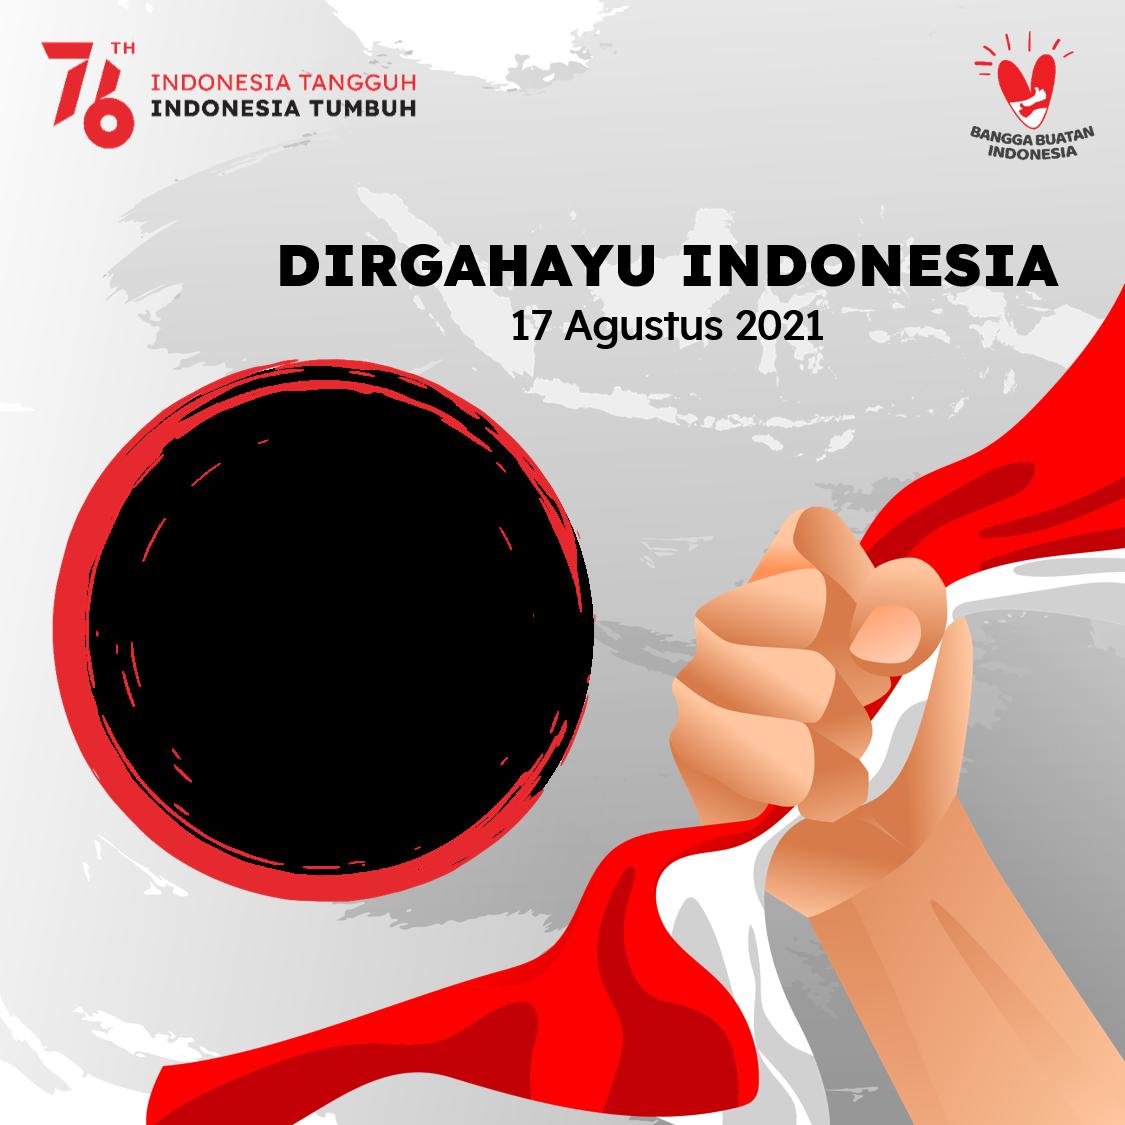 Link Background Bingkai Foto Twibbon Dirgahayu Indonesia 17 Agustus 2021